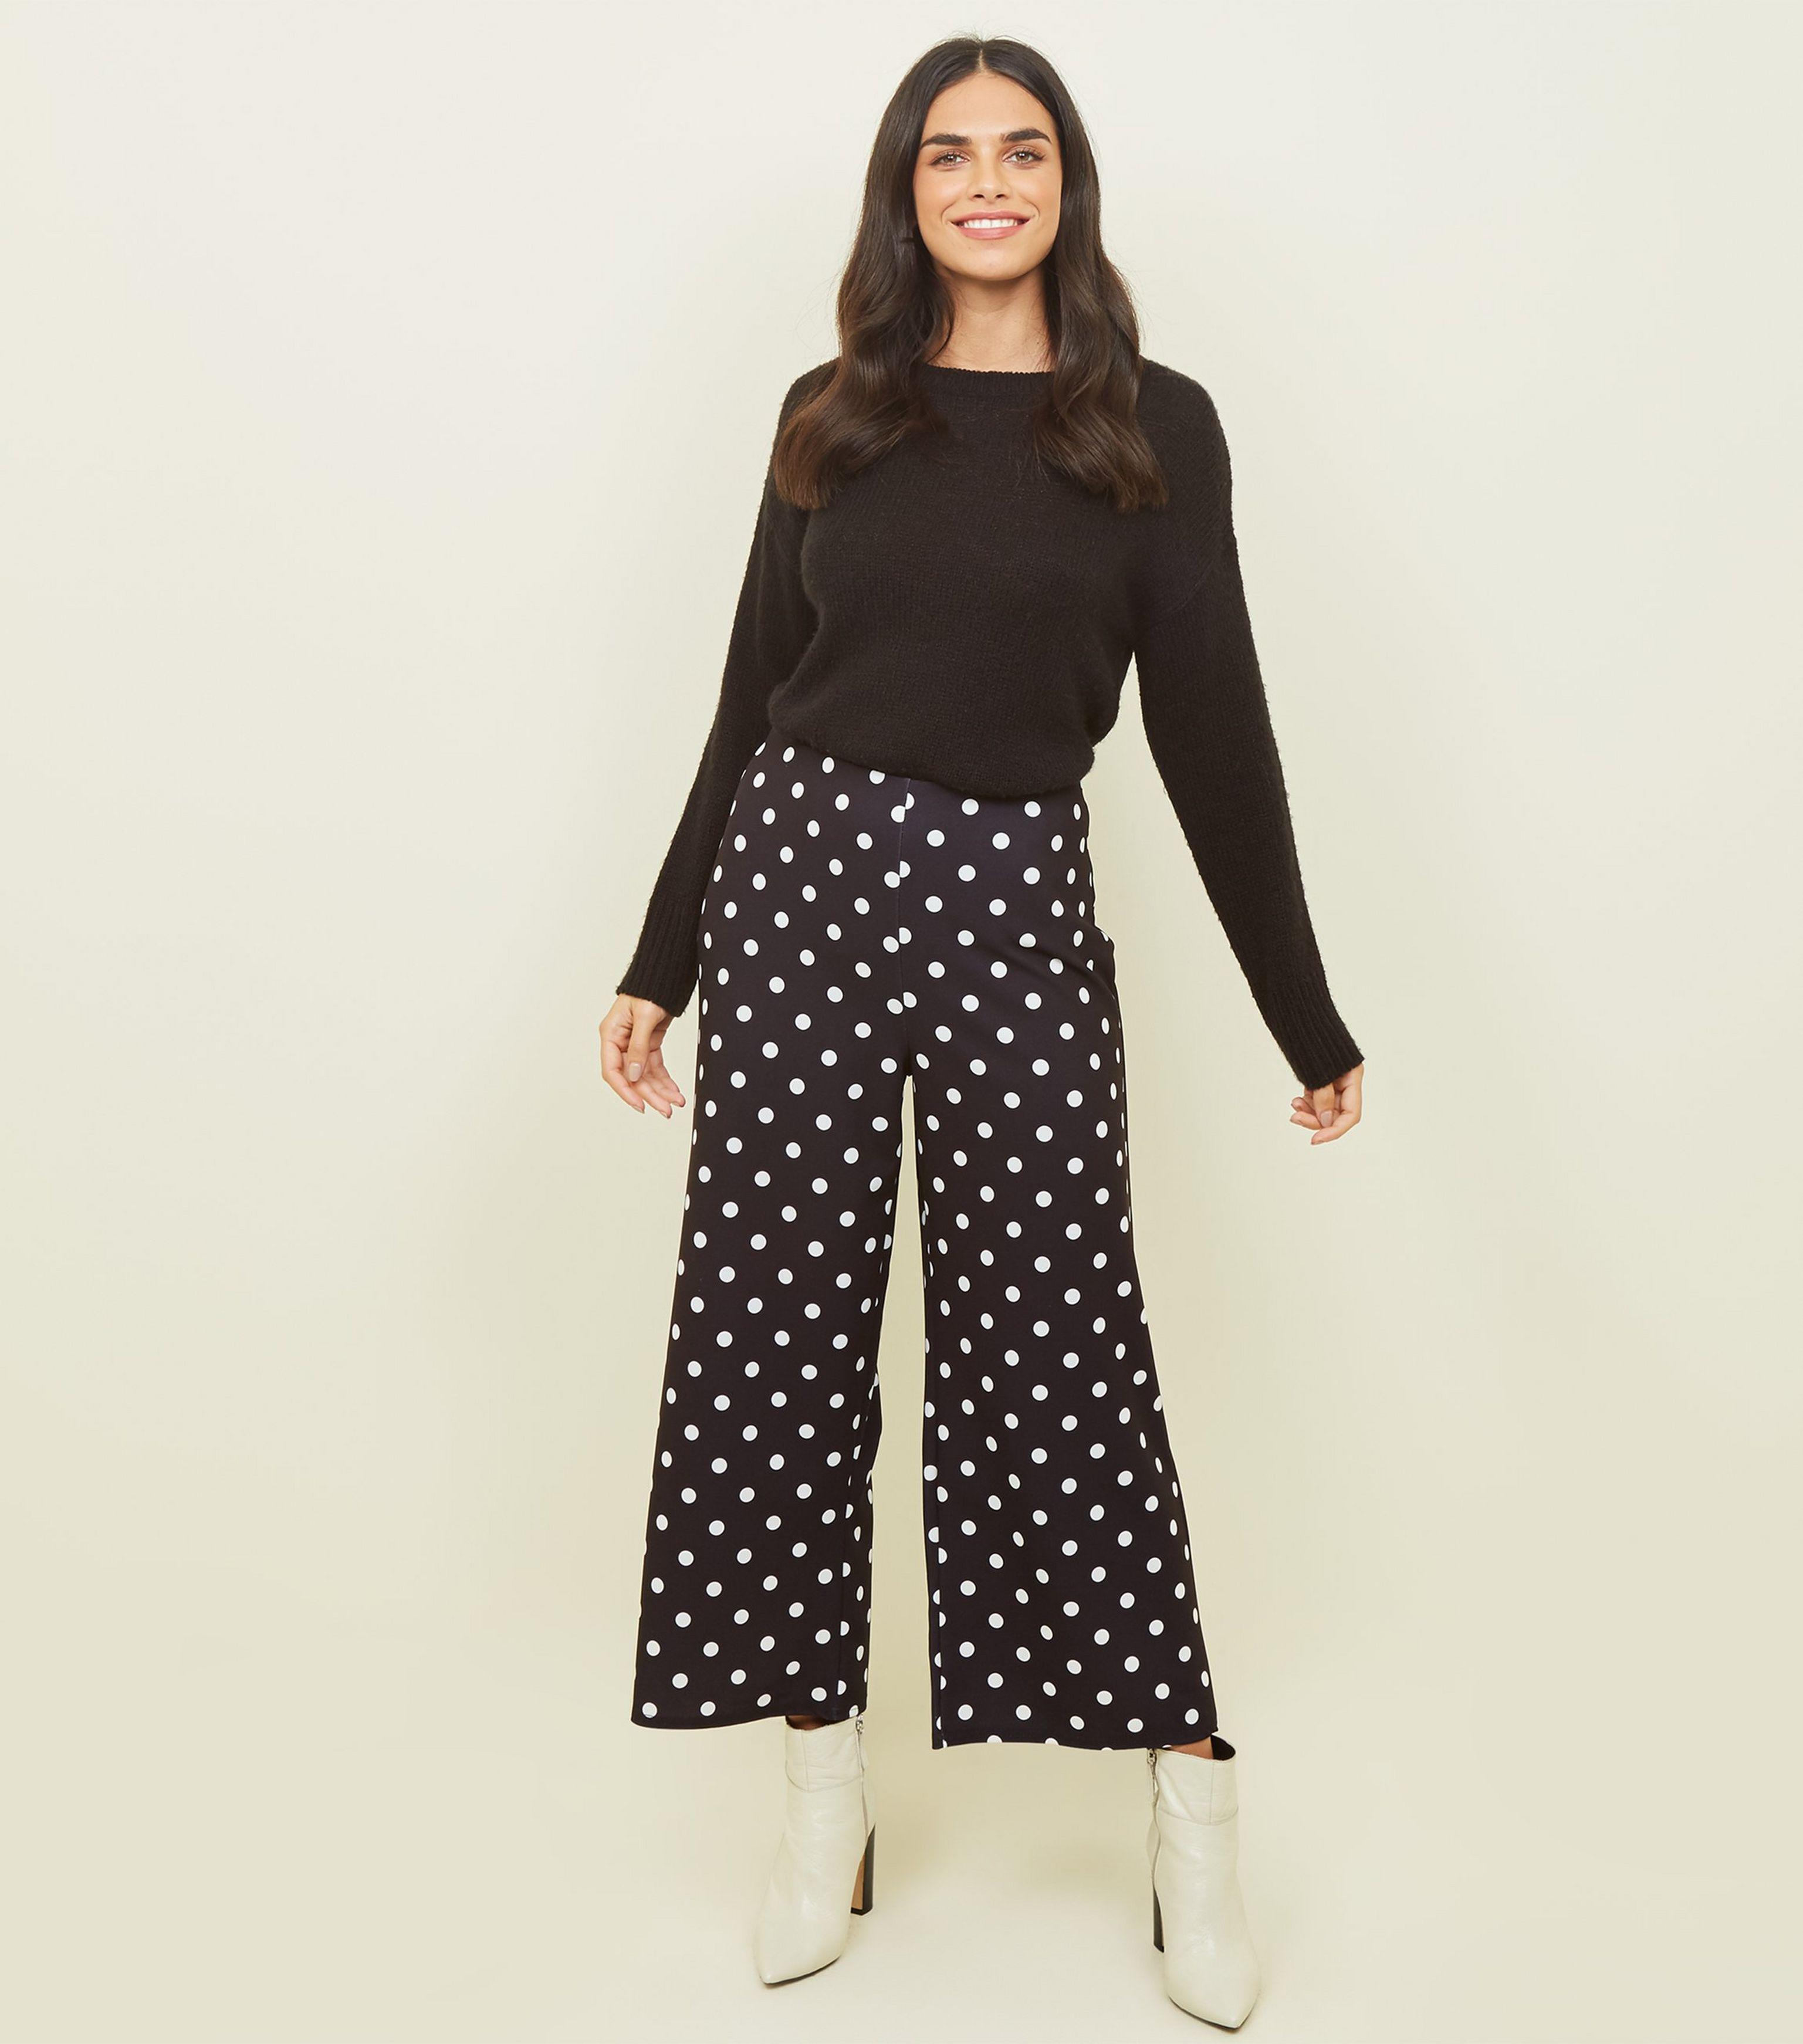 e17abd7e06b New Look Tall Black Spot Print Cropped Trousers in Black - Lyst